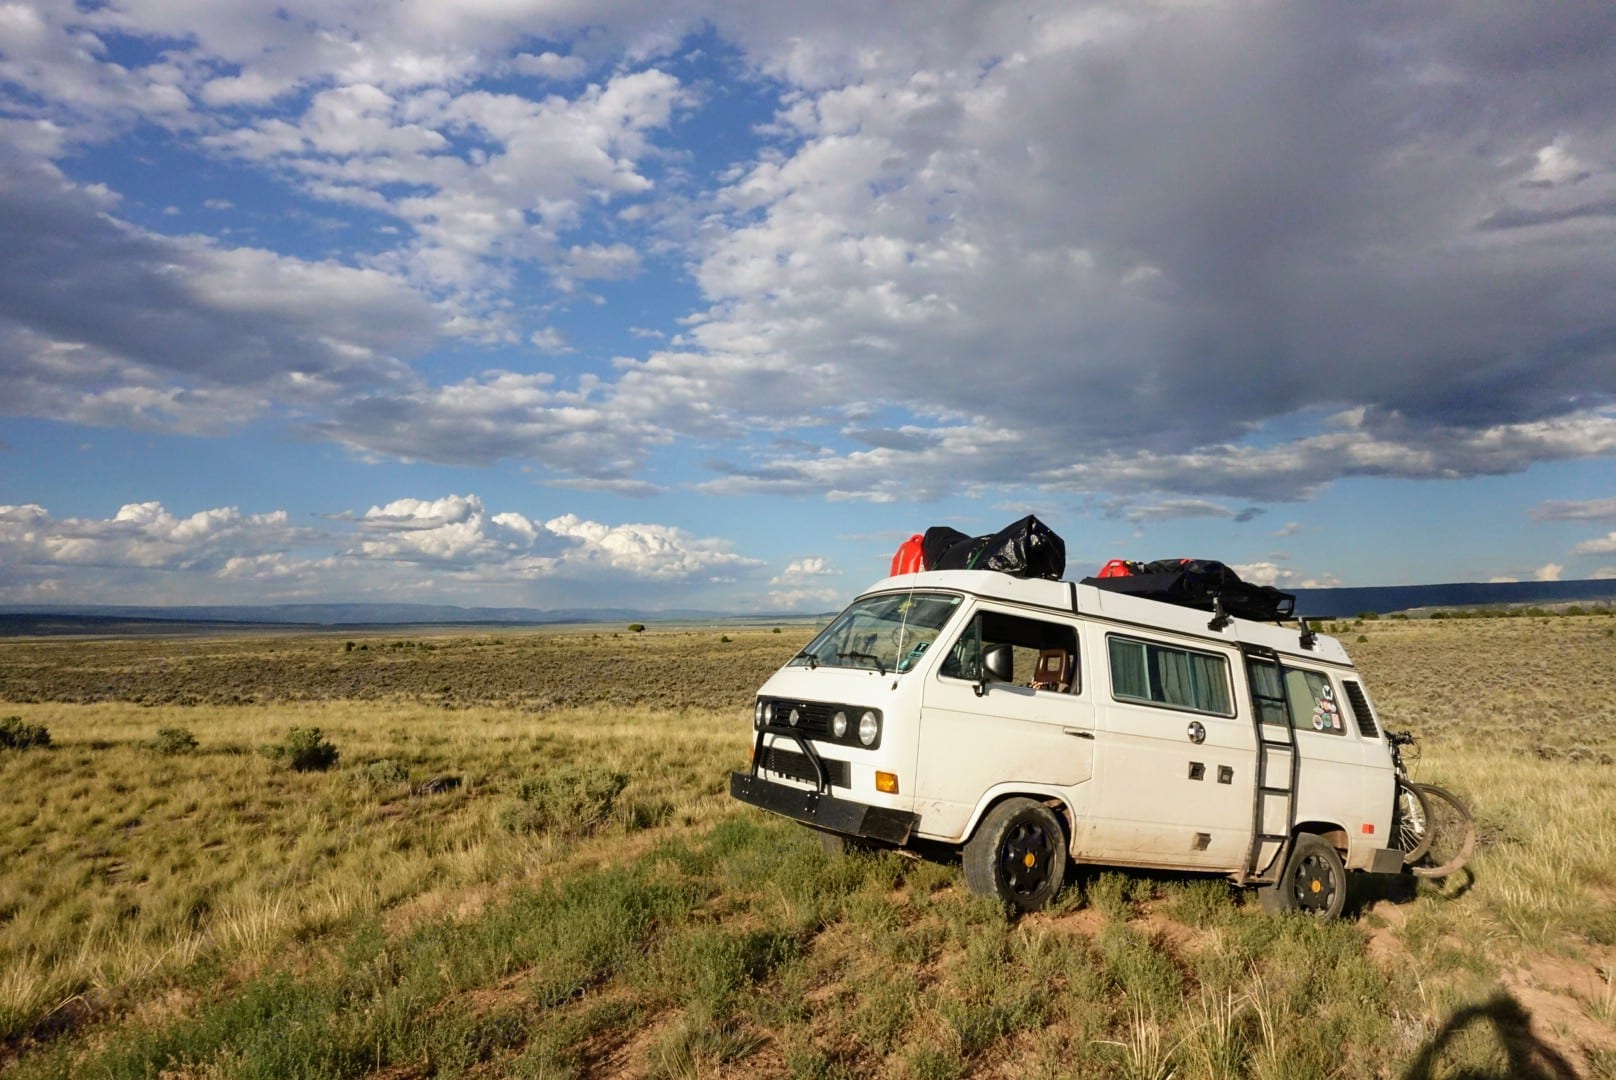 Somewhere in Southwestern Colorado. Volkswagen Westfalia T3 1984